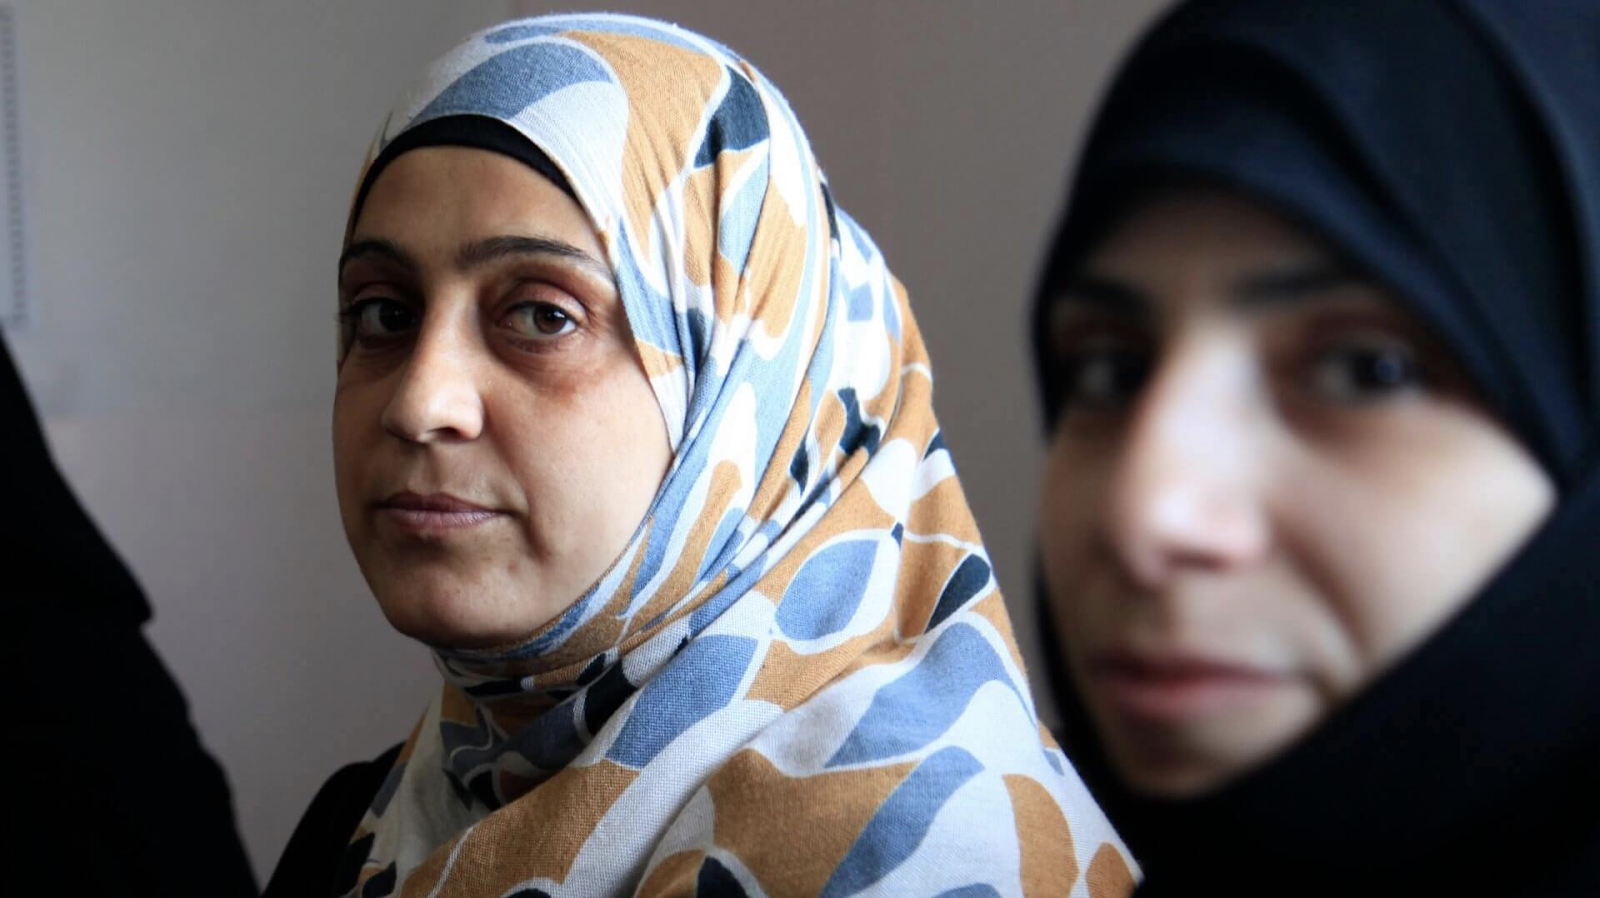 Muslin women wearing hijab waiting for their asylum green card interview